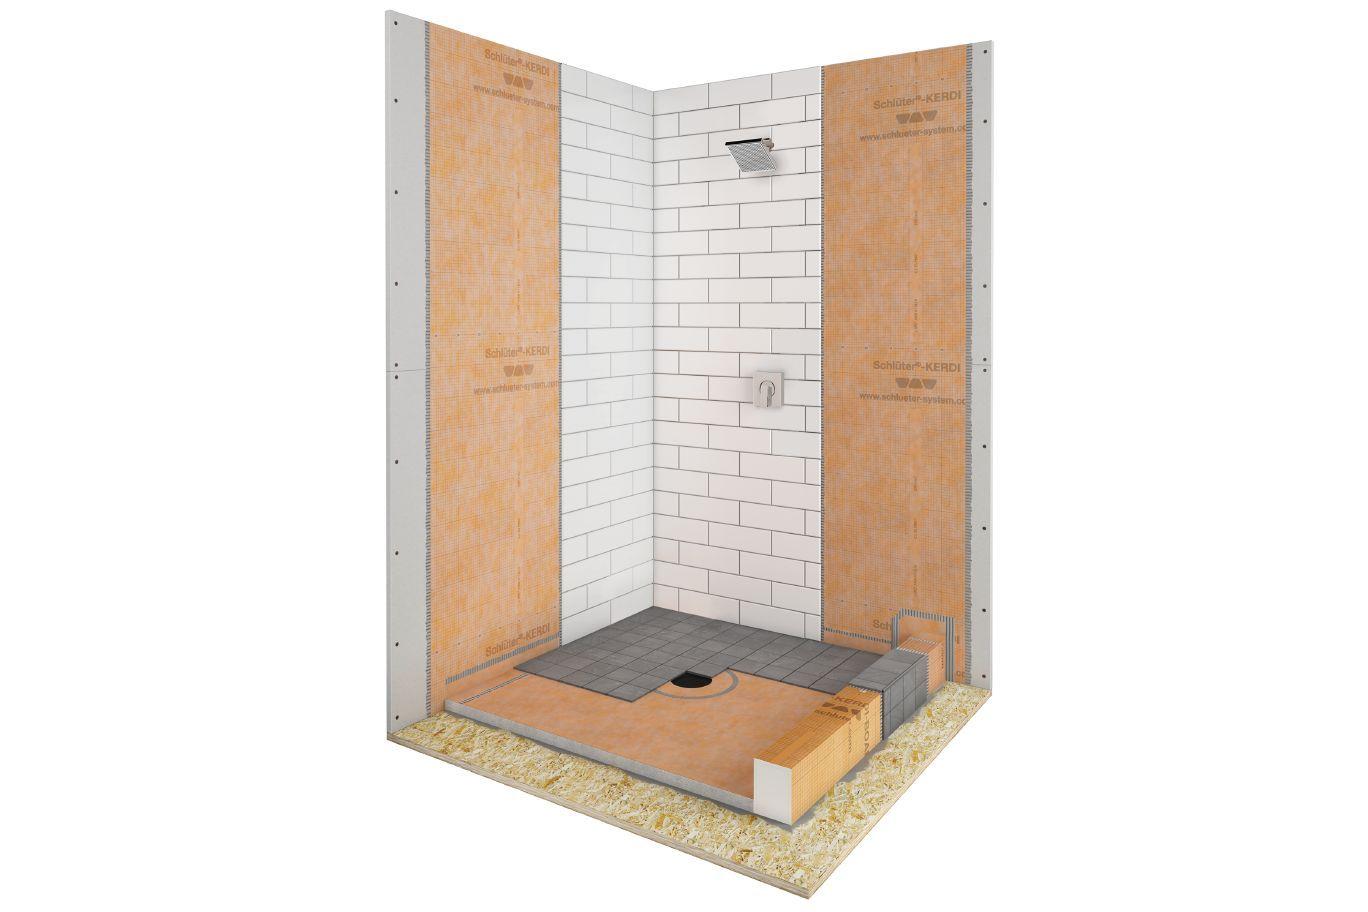 Schluter Kerdi Shower Kit Shower Kits Sauna Kits Shower Systems